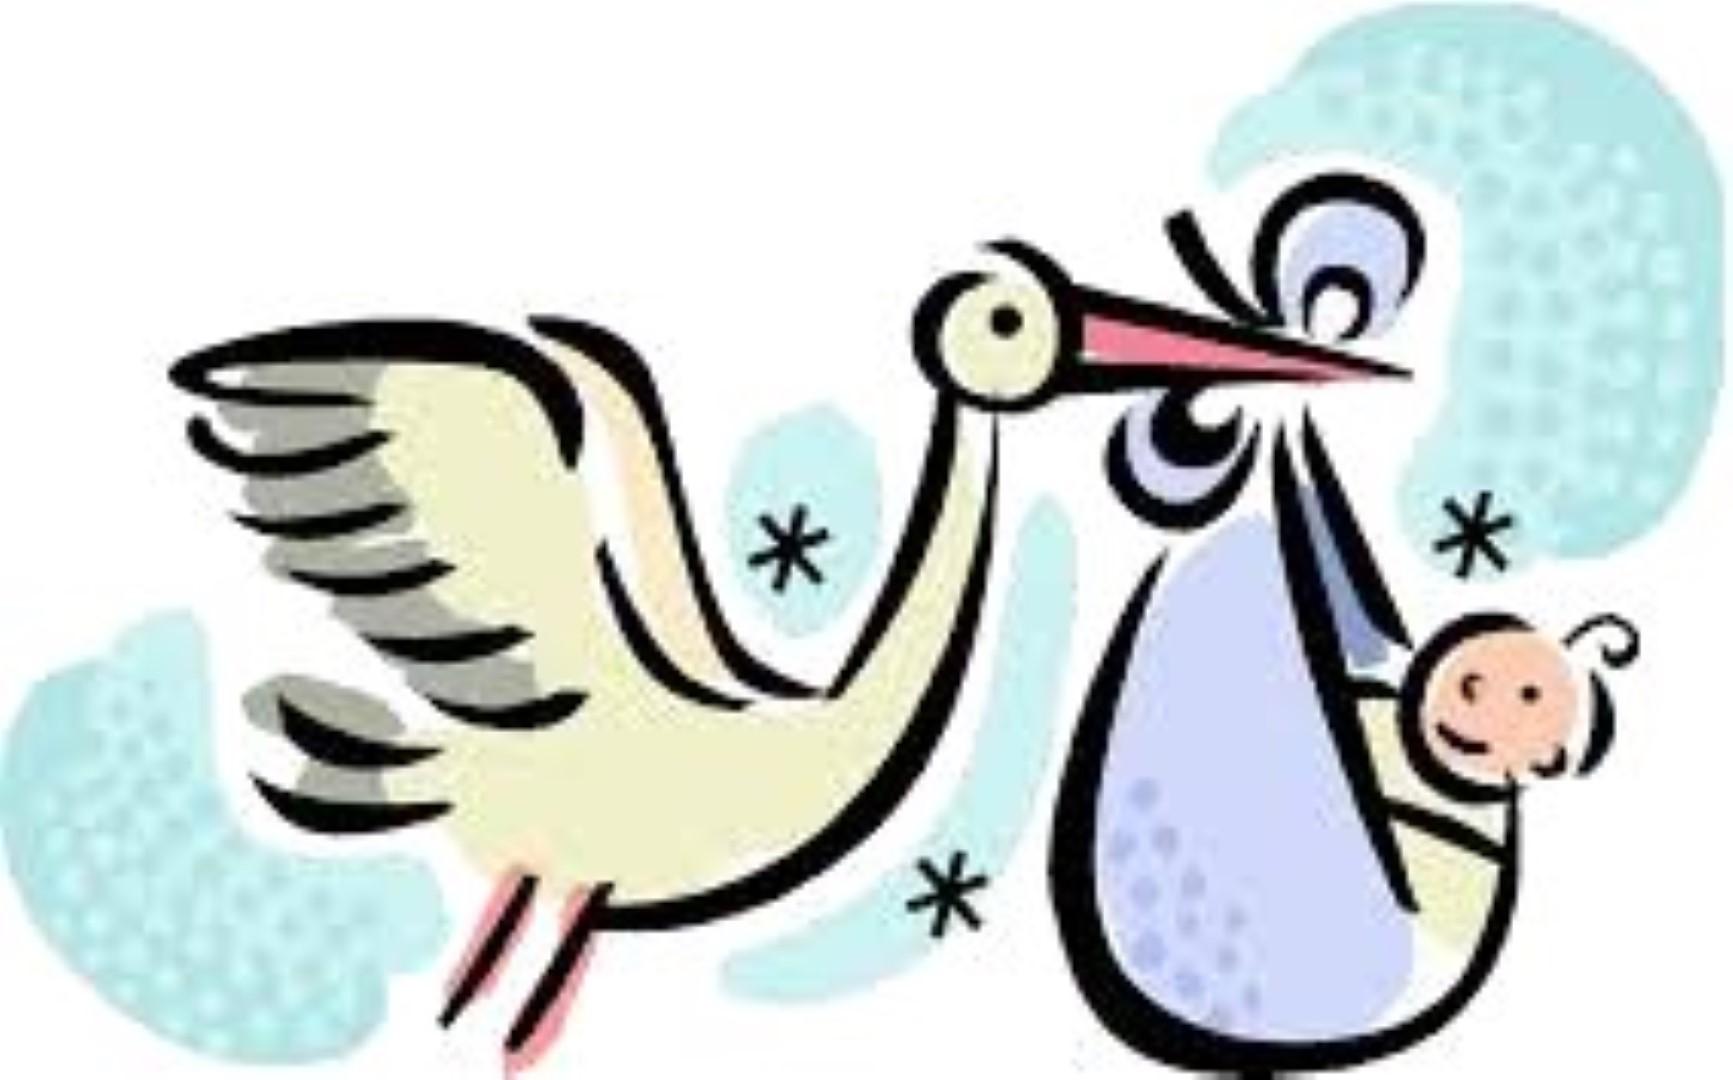 Avis de naissance (illustration)